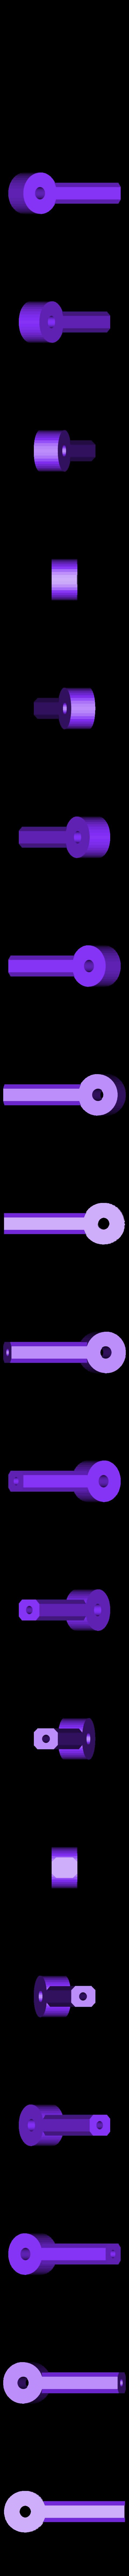 Fan-Cowl-Stop02.stl Download STL file Thrust Reverser with Turbofan Engine Nacelle • 3D printable model, konchan77